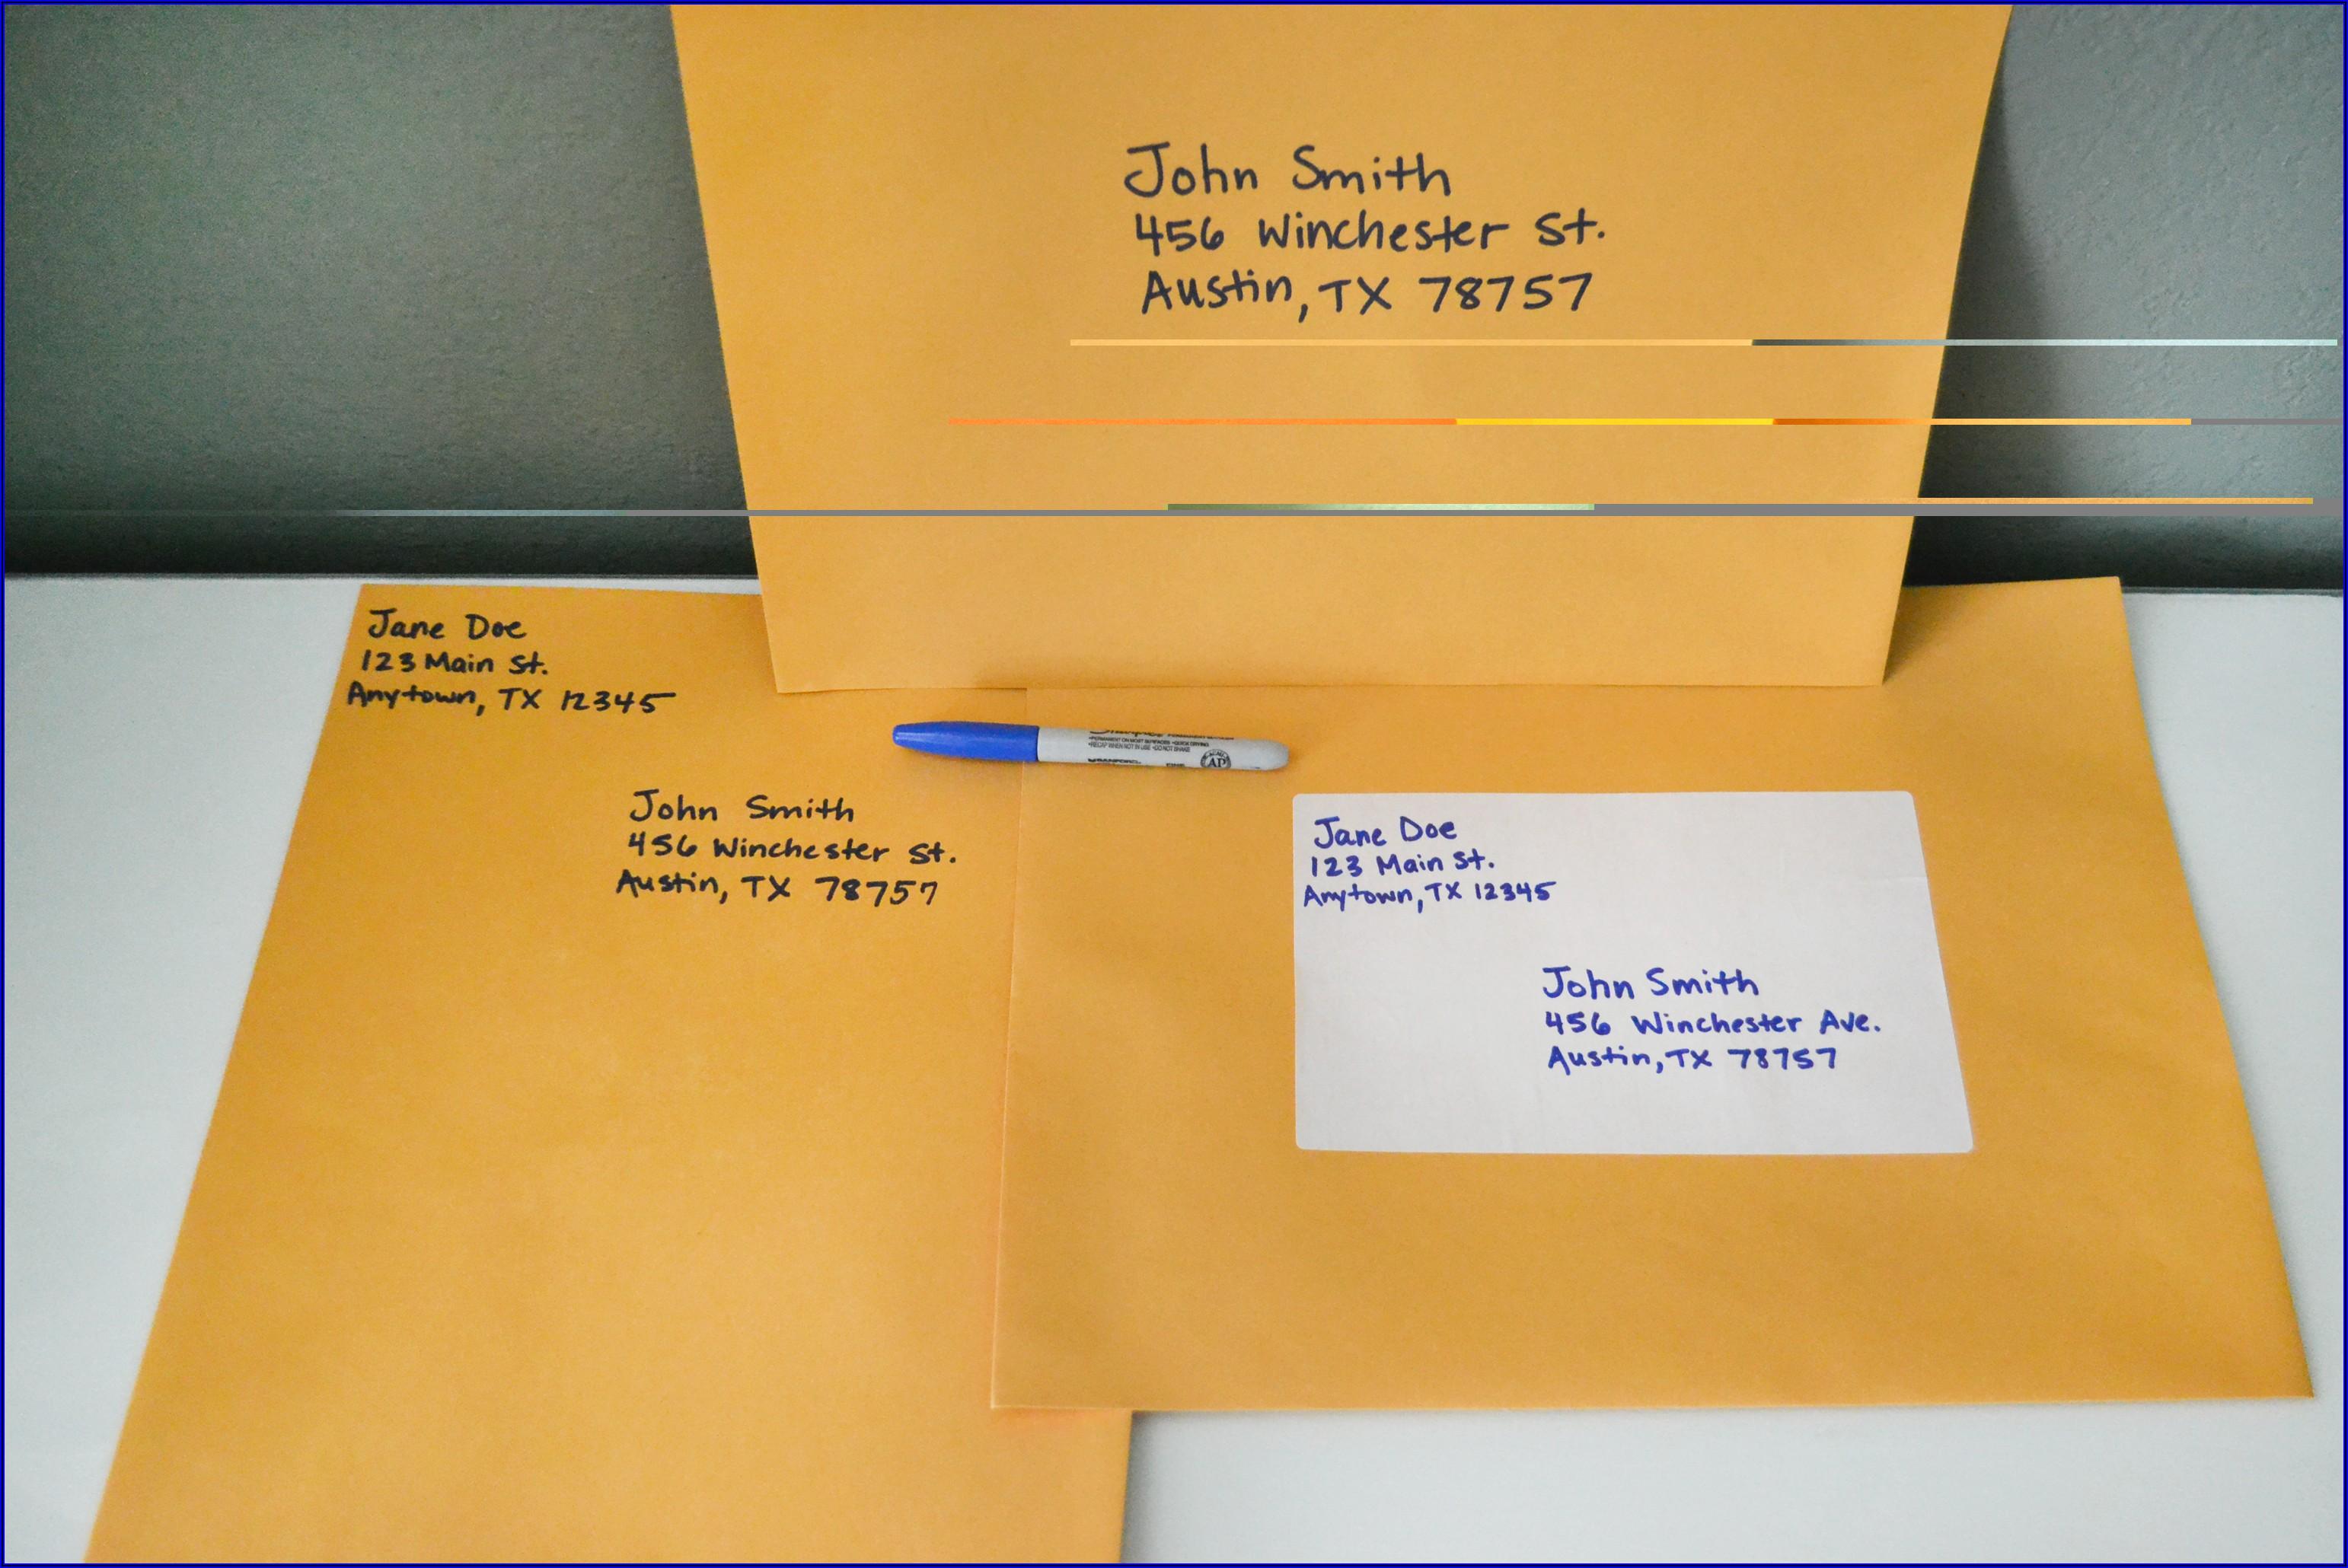 Postage For 9x12 Manila Envelope